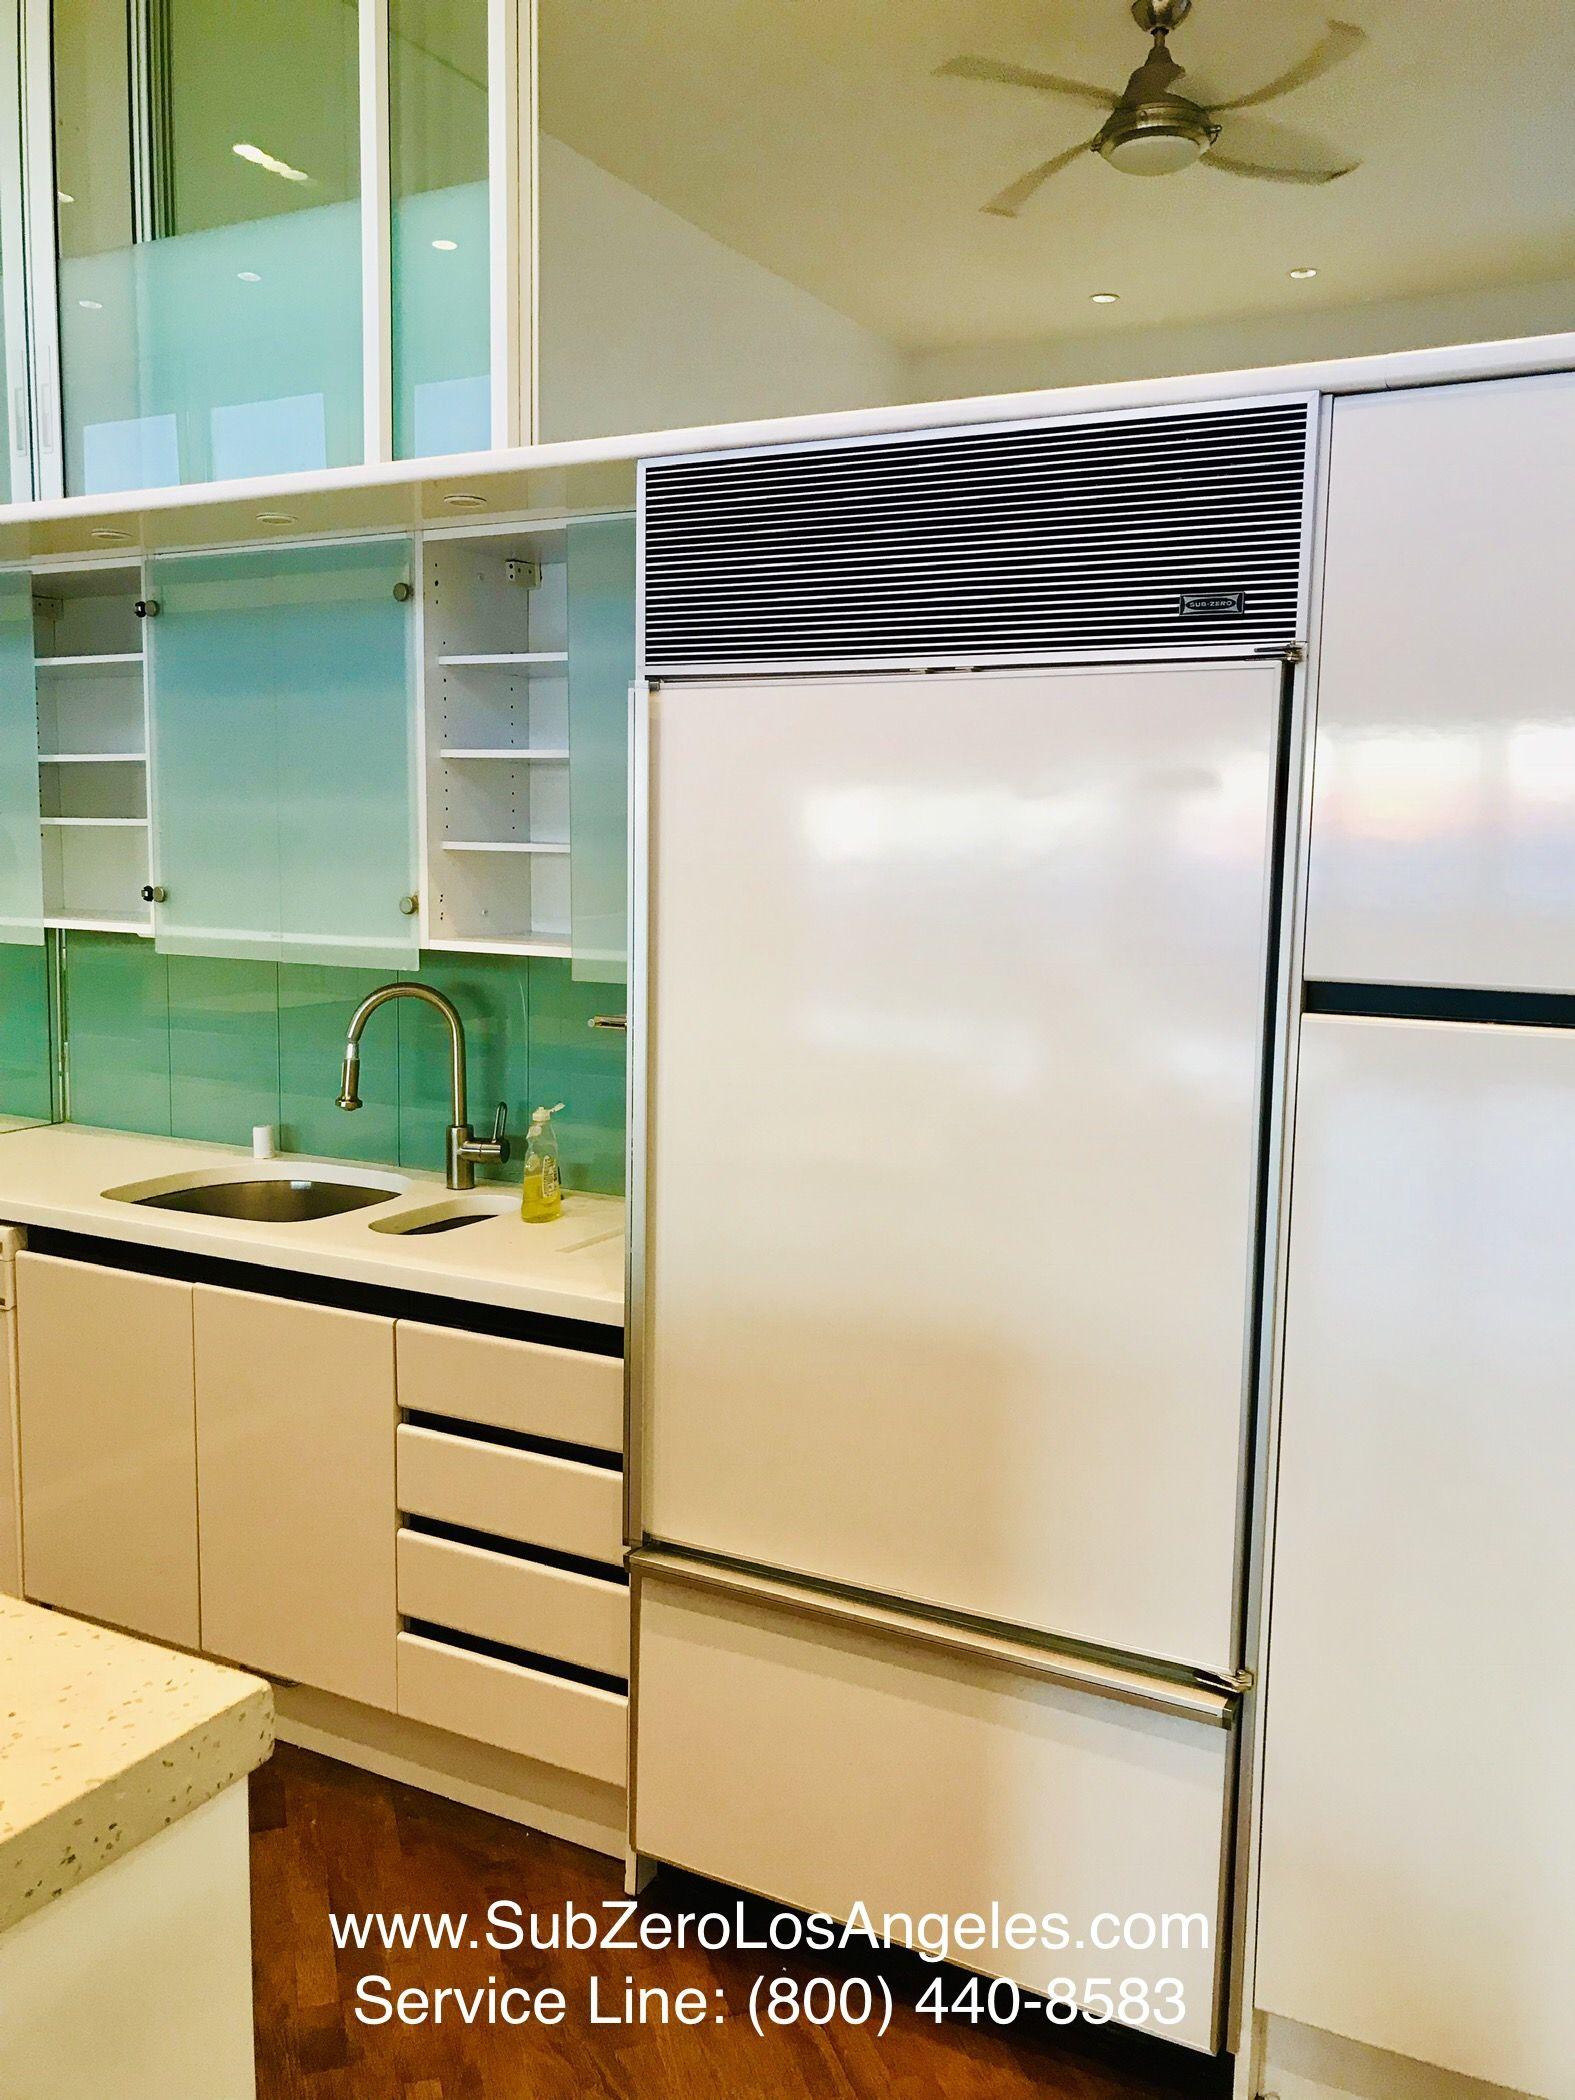 Subzerorefrigerator Model 650 Repaired By Us In Beverlyhills